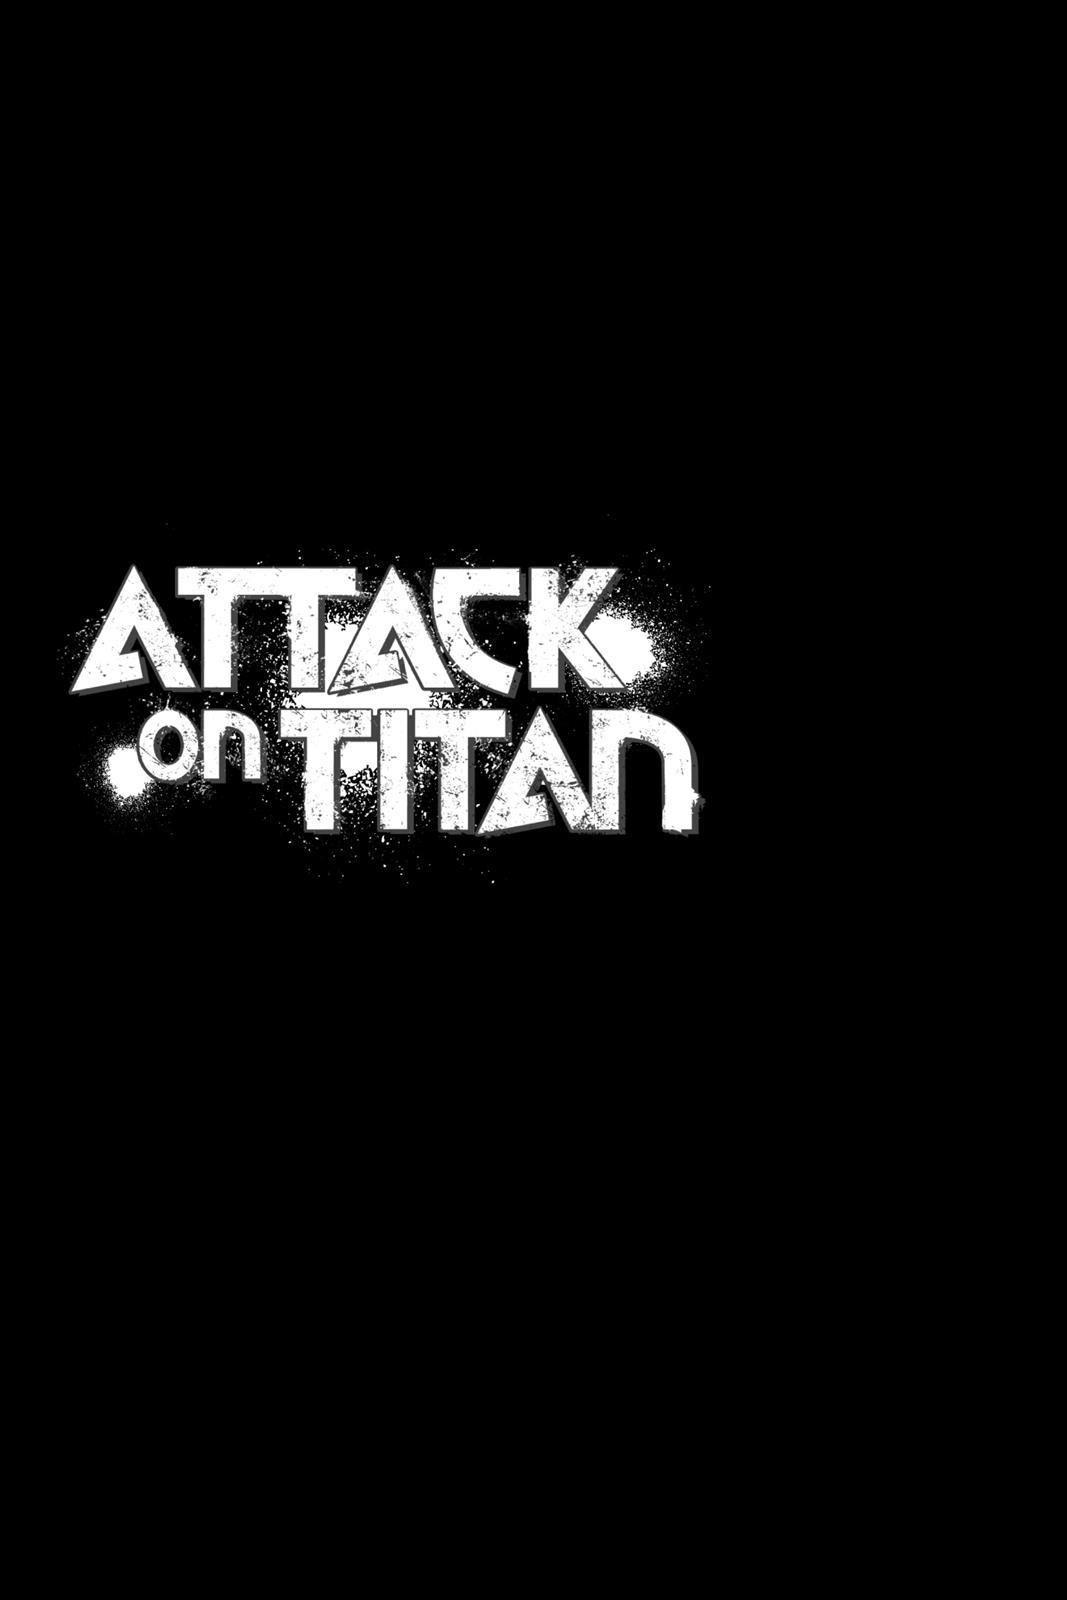 Attack On Titan, Episode 108 image 046